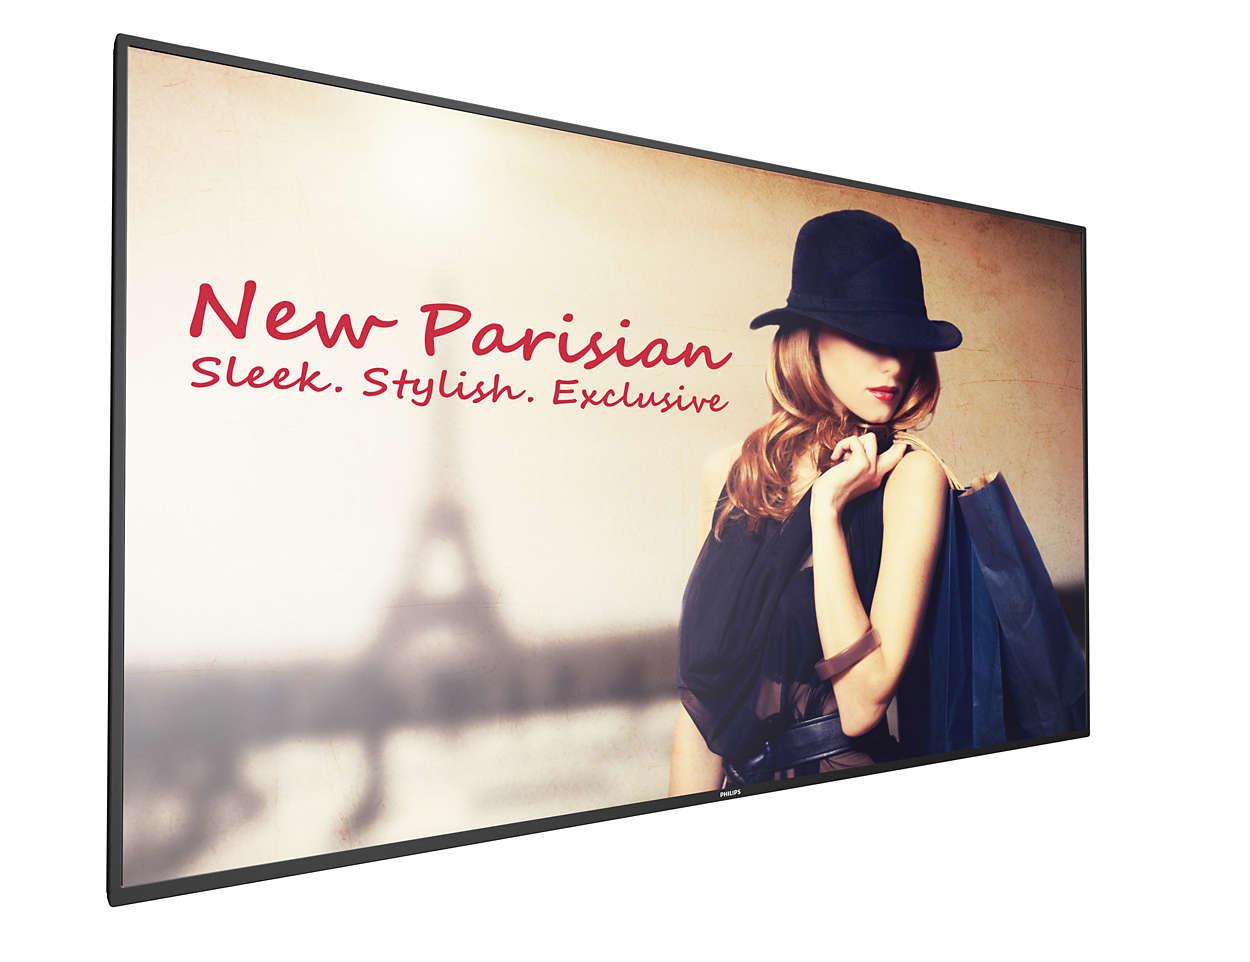 "Philips 55BDL4150D/00 pantalla de señalización 138,8 cm (54.6"") 4K Ultra HD Pantalla plana para señalización digital Negro Android 7.1.2"